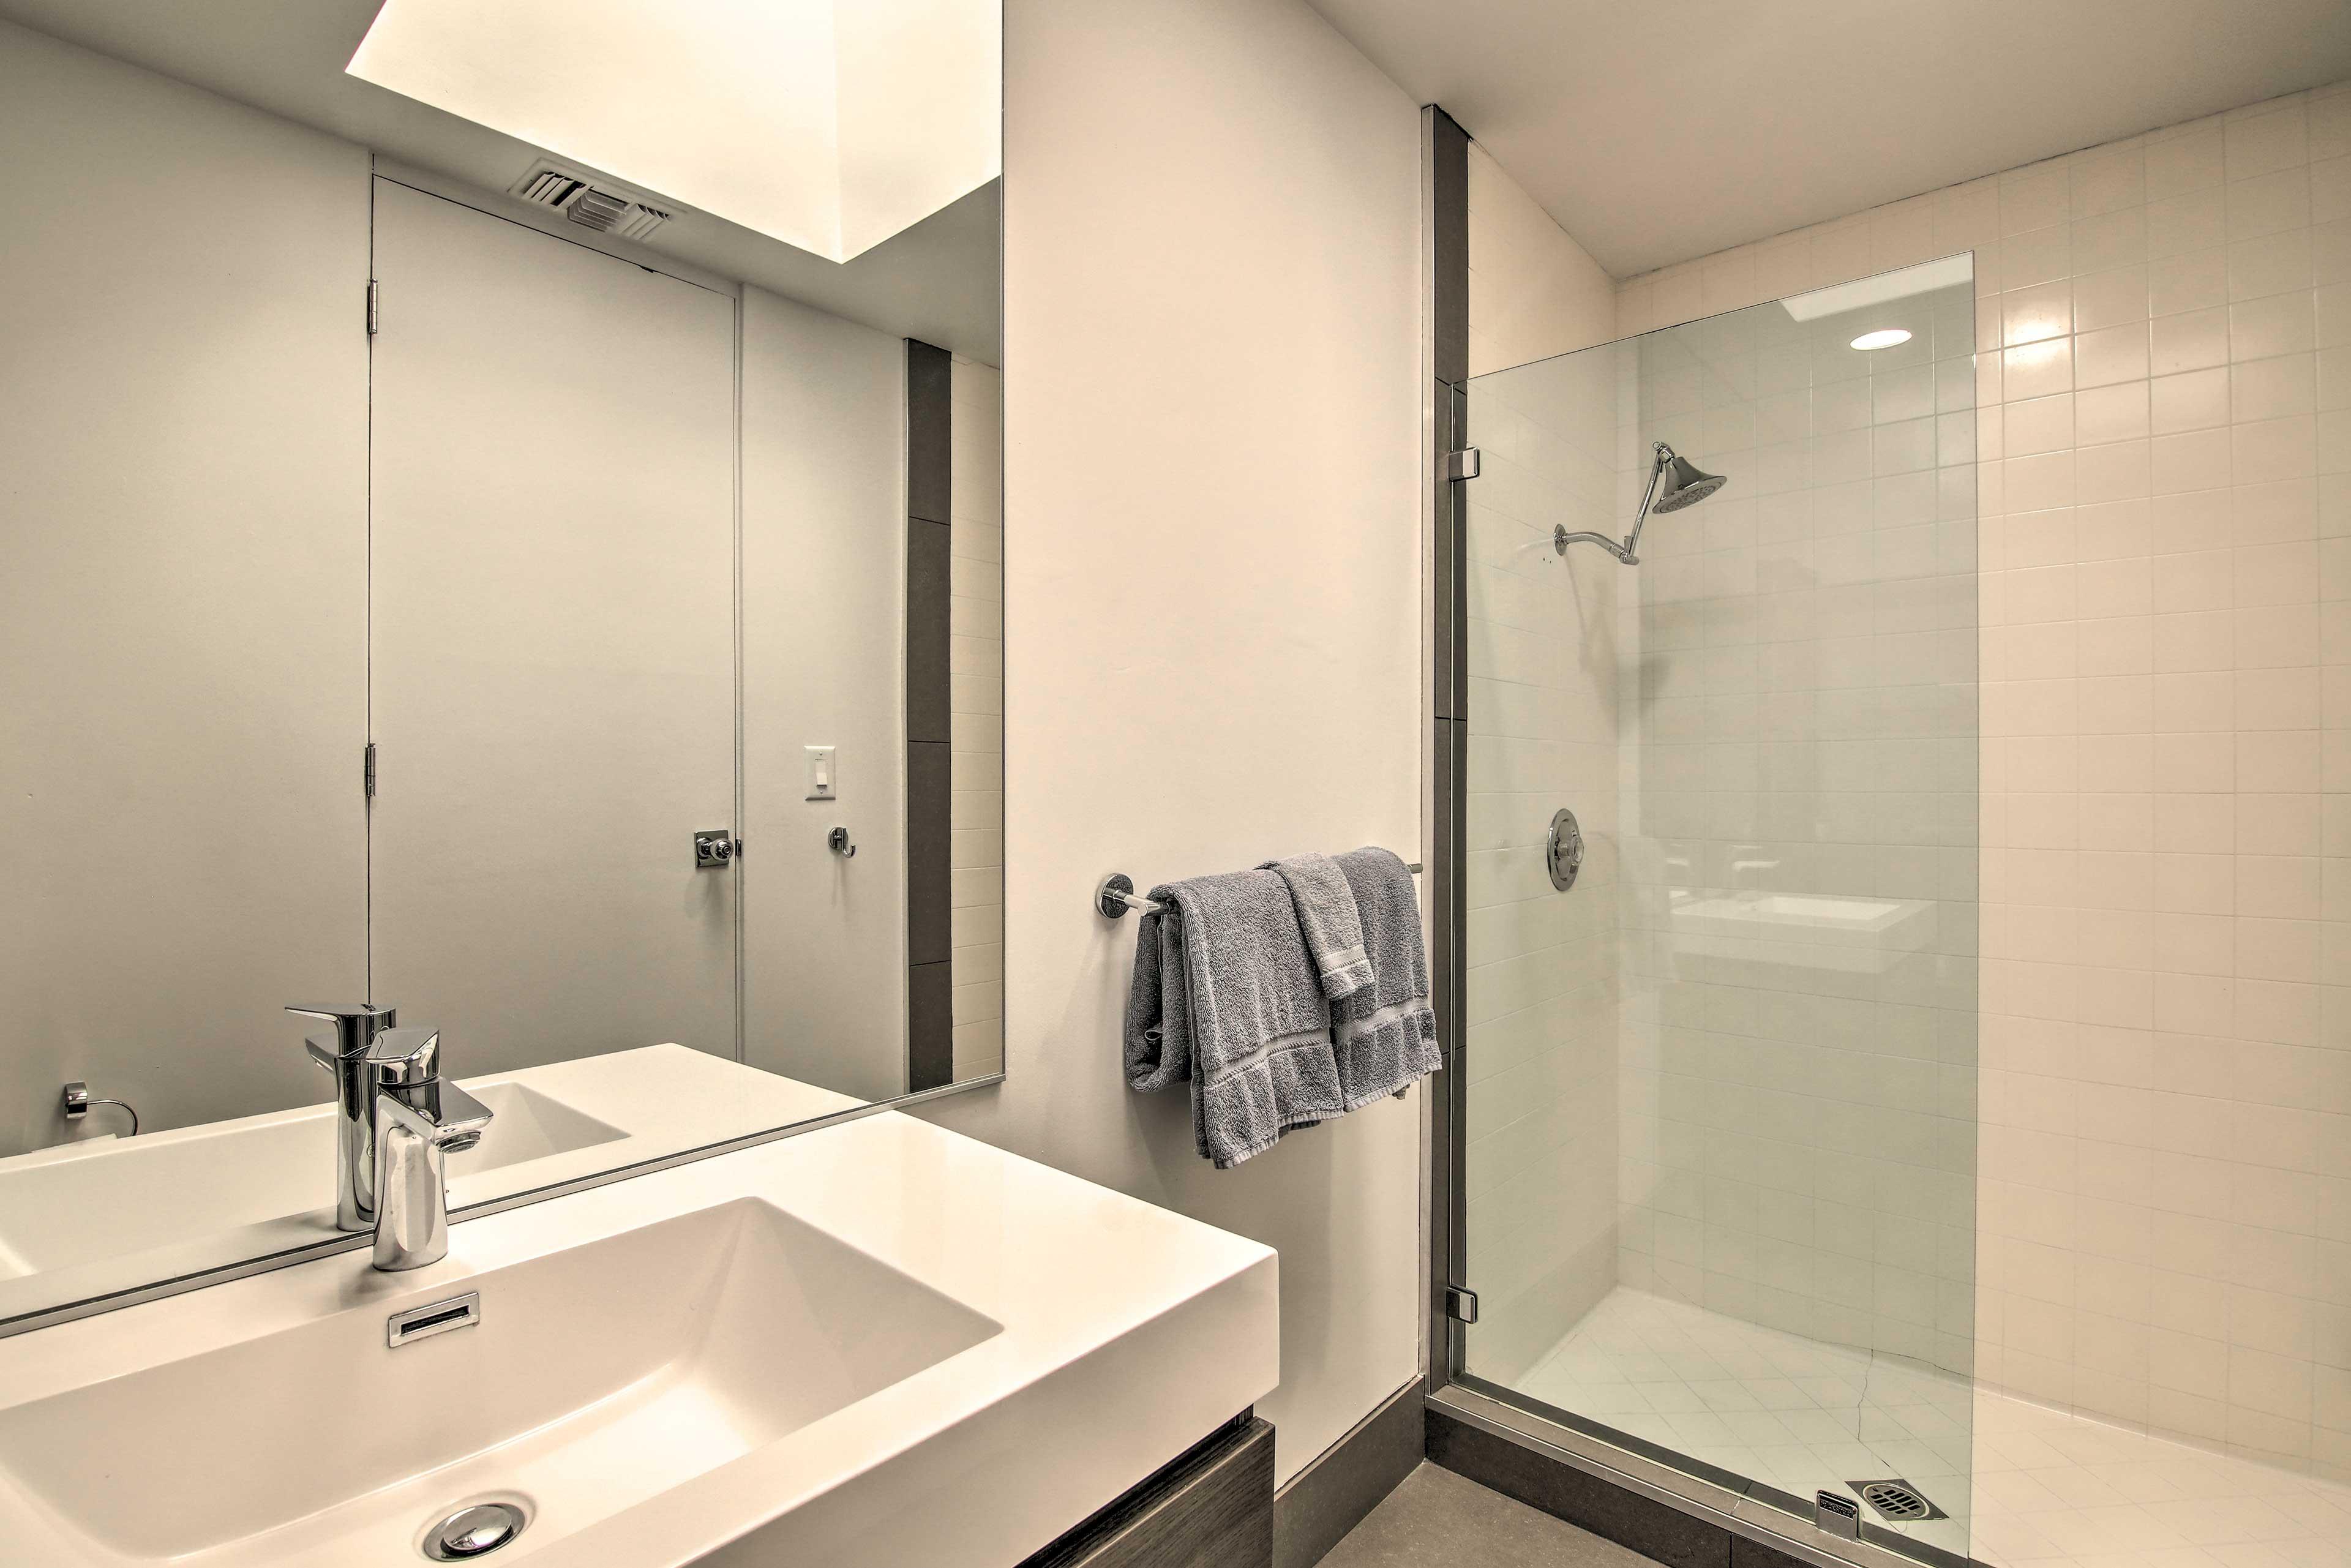 Bathroom | Towels Provided | Complimentary Toiletries